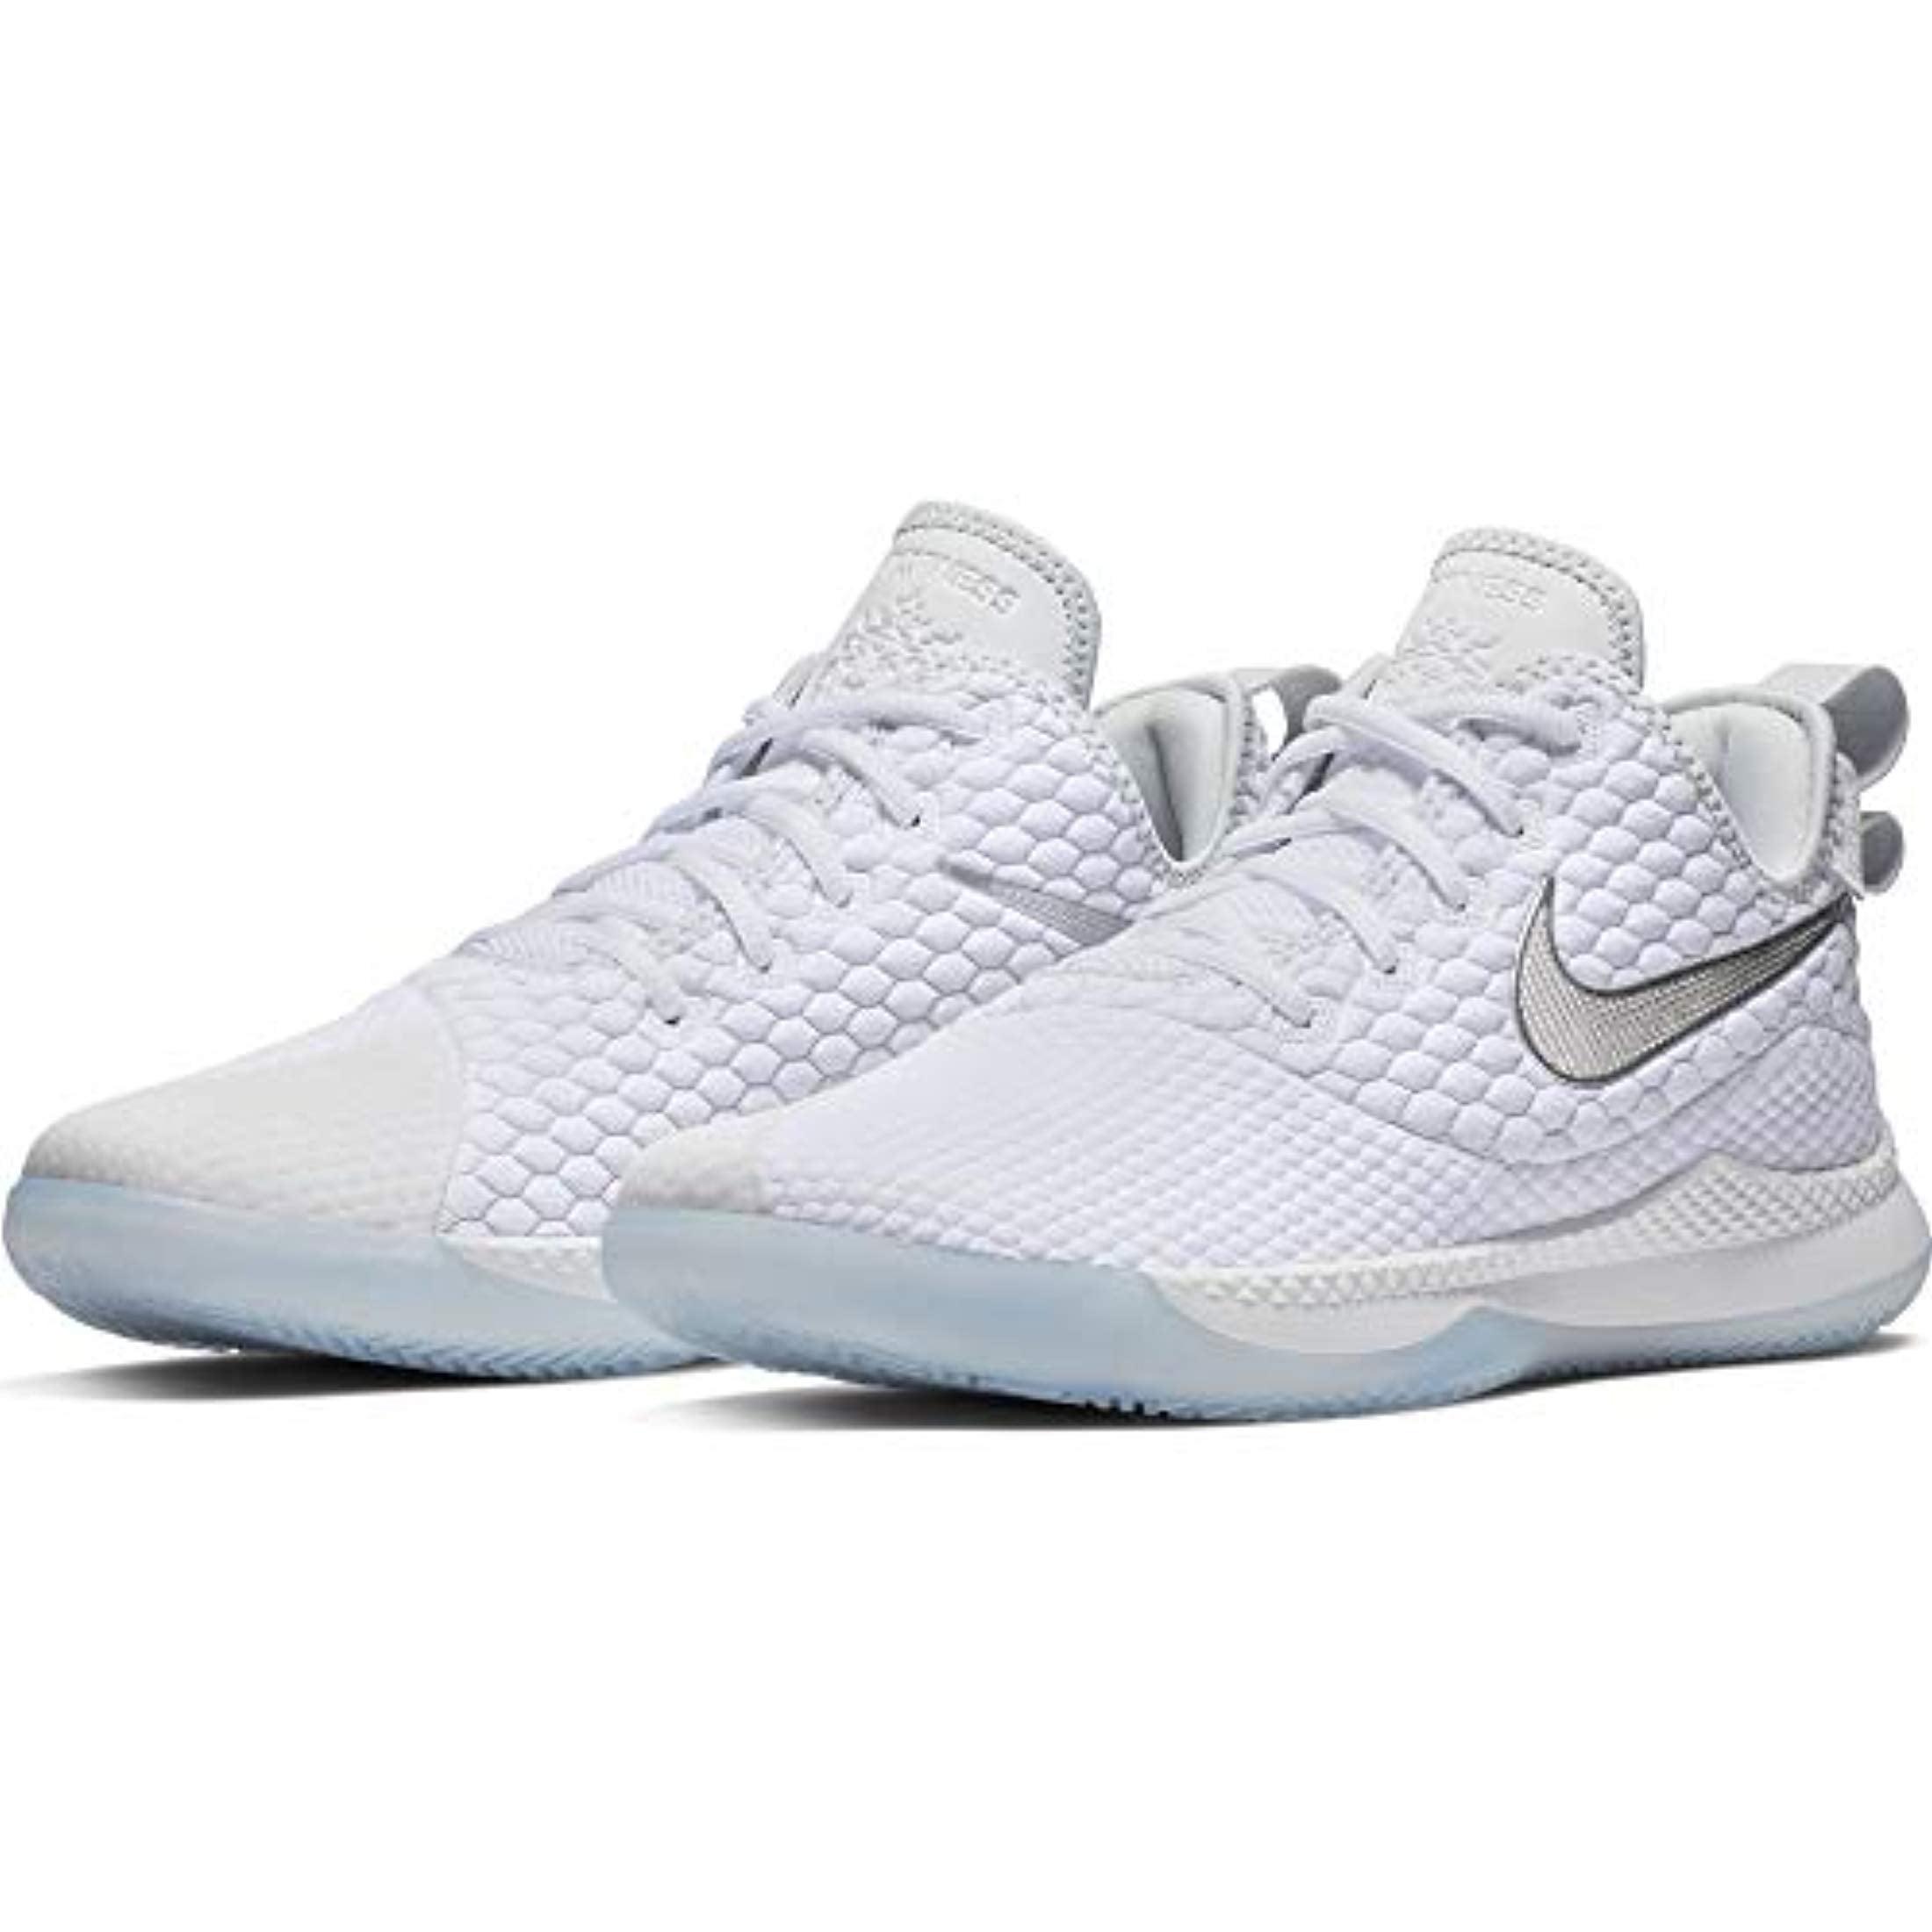 Nike - Nike Men's Lebron Witness III Basketball Shoe White/Chrome/Pure  Platinum/Wolf Grey Size 14 M US - Walmart.com